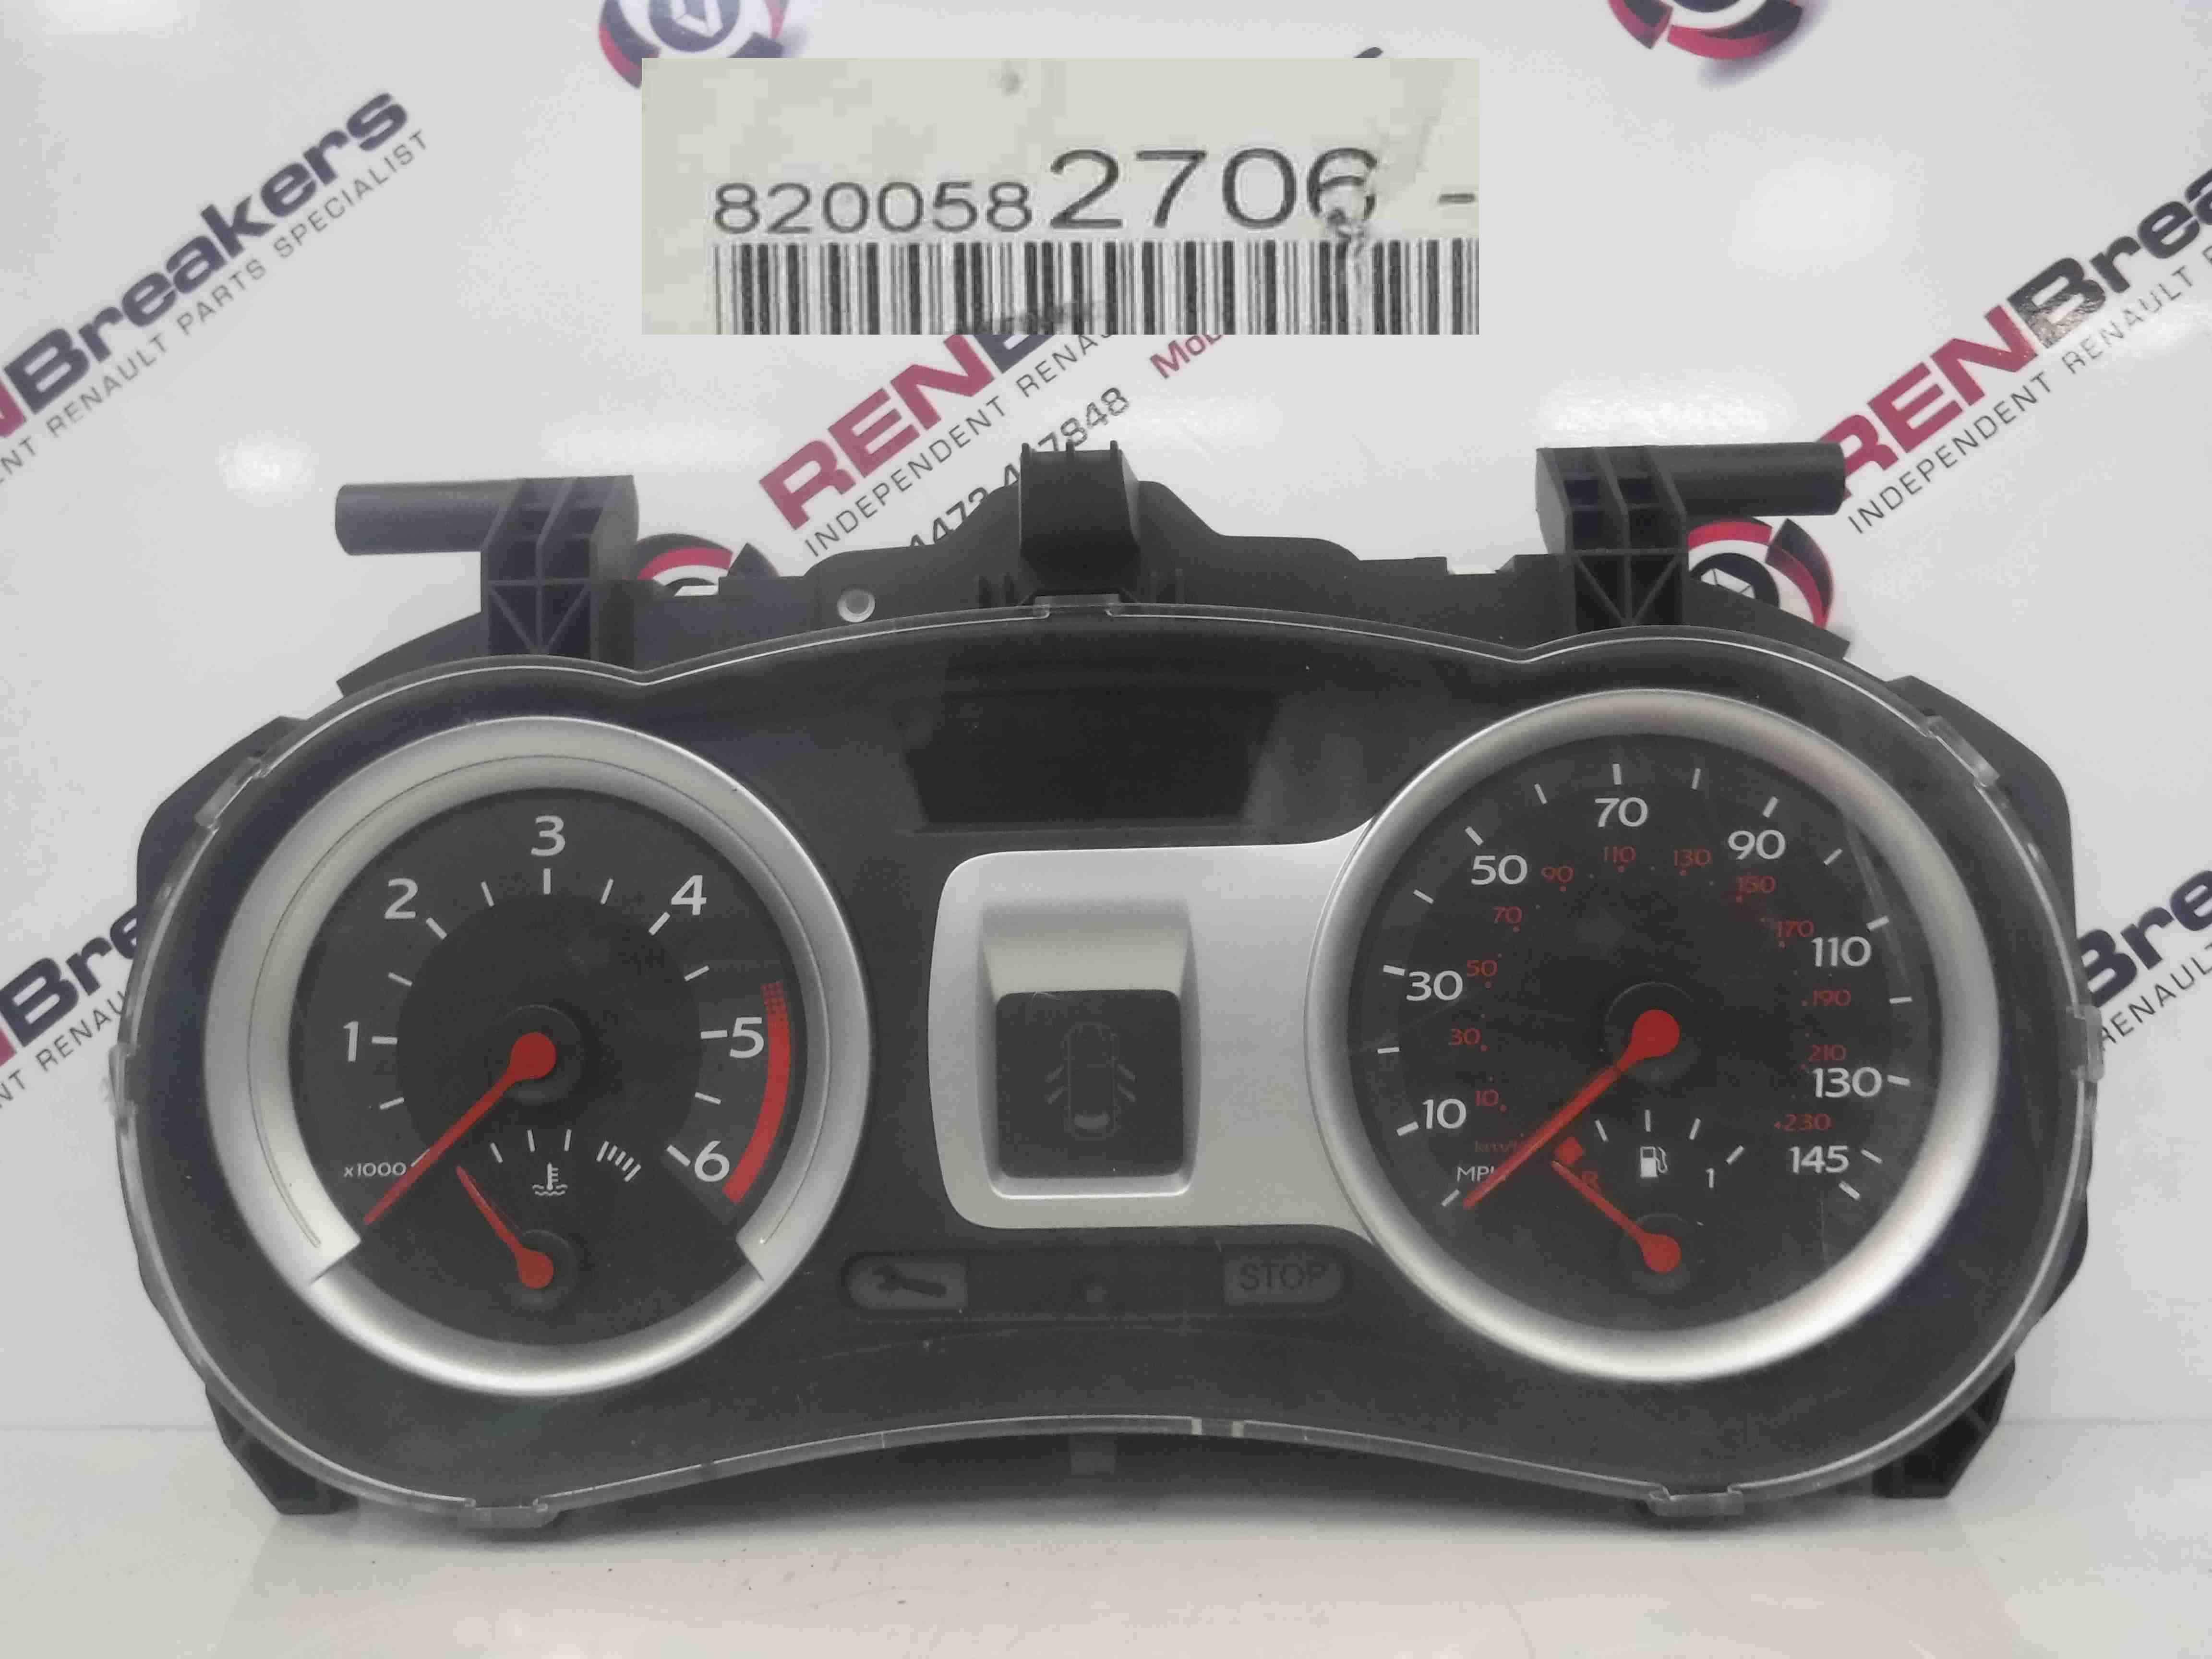 Renault Clio MK3 2005-2012 Instrument Panel Dials Gauges Clocks 111K 8200582706